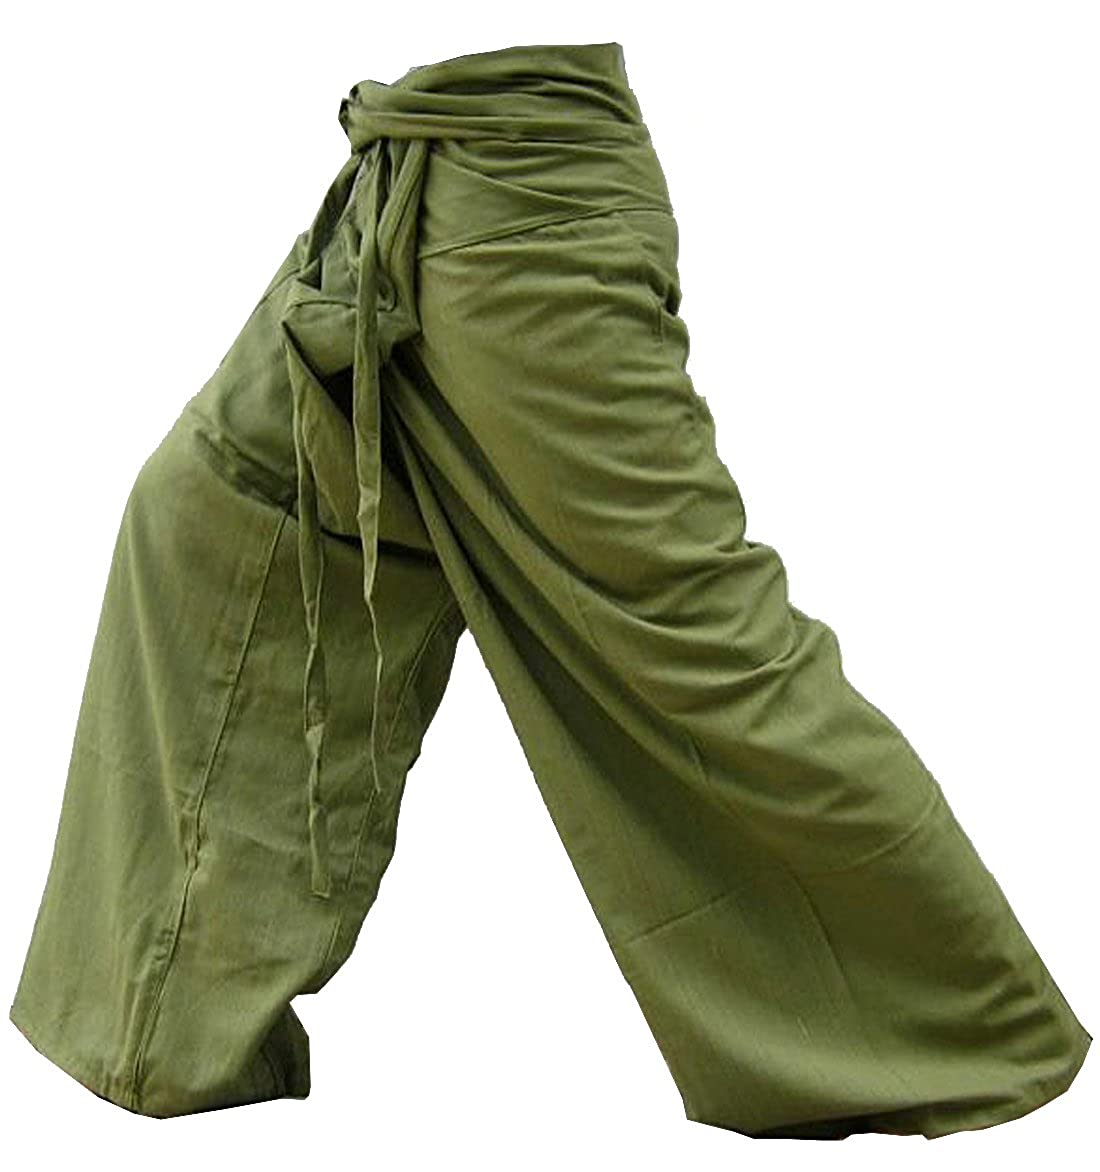 Solid Olive Original Thai Fisherman Yoga Pants Travel Pants Unisex Trouser Thai Hand Weave Heavy Cotton